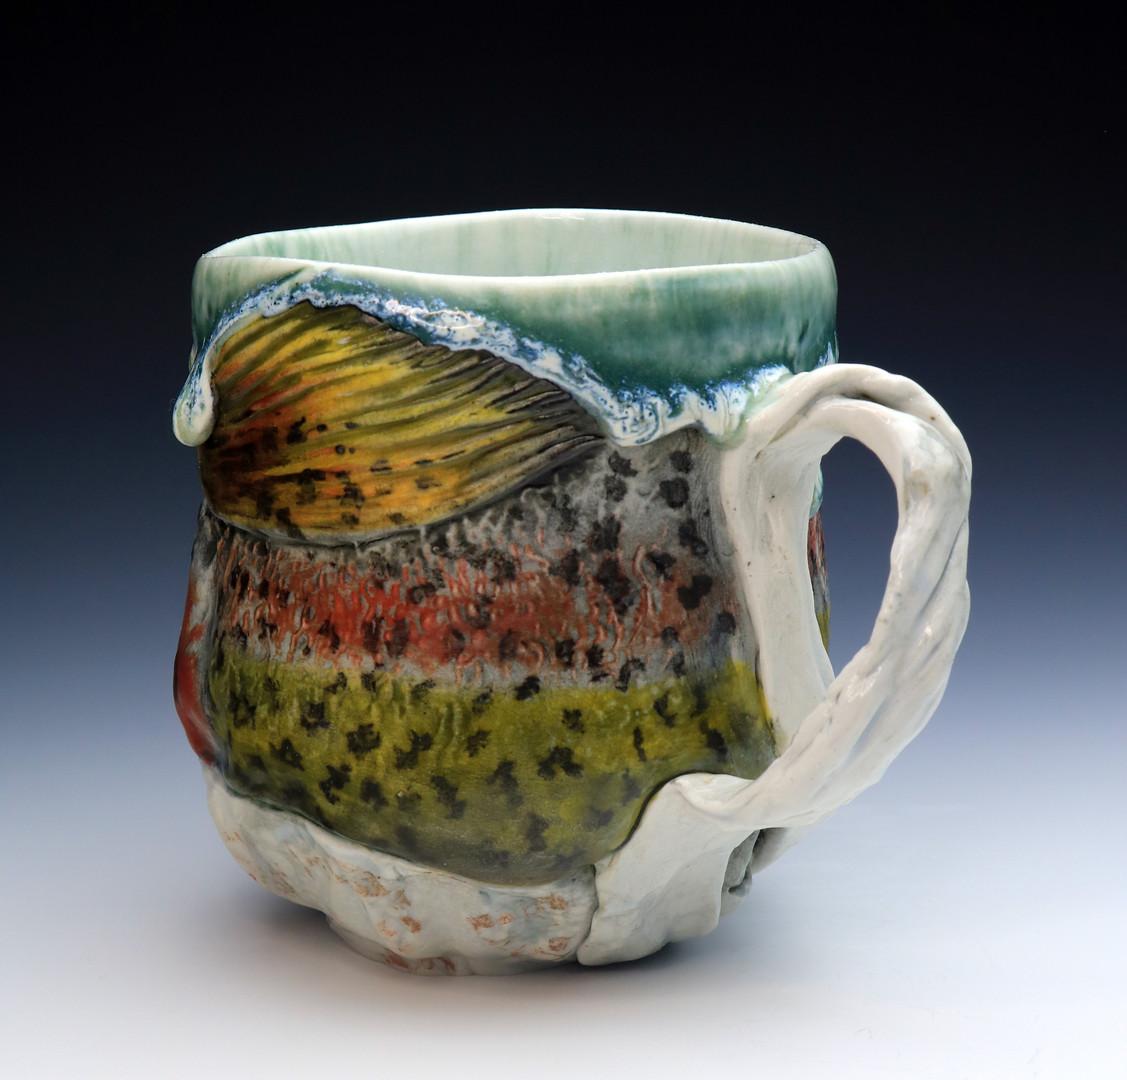 Trout Mug III